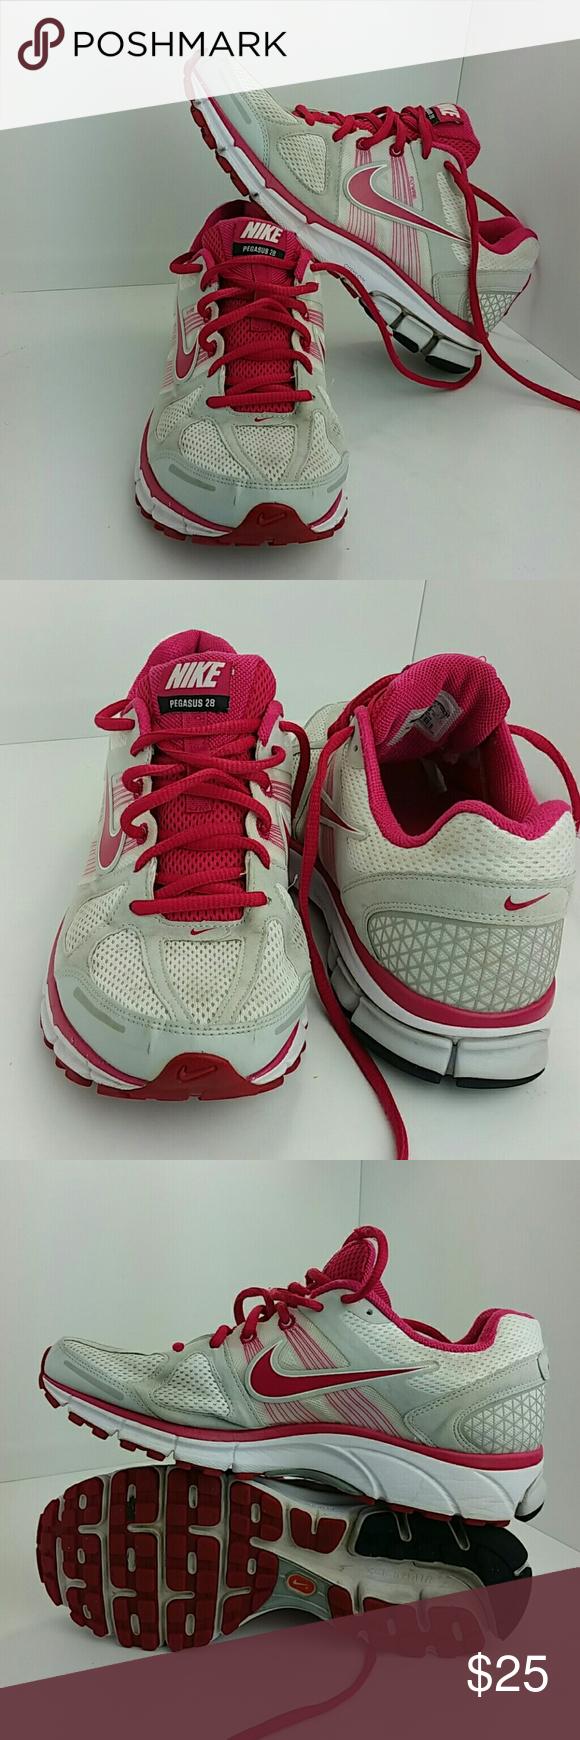 cartel dilema Anual  NIKE PEGASUS 28 WOMEN SHOES   Nike pegasus, Women shoes, Women